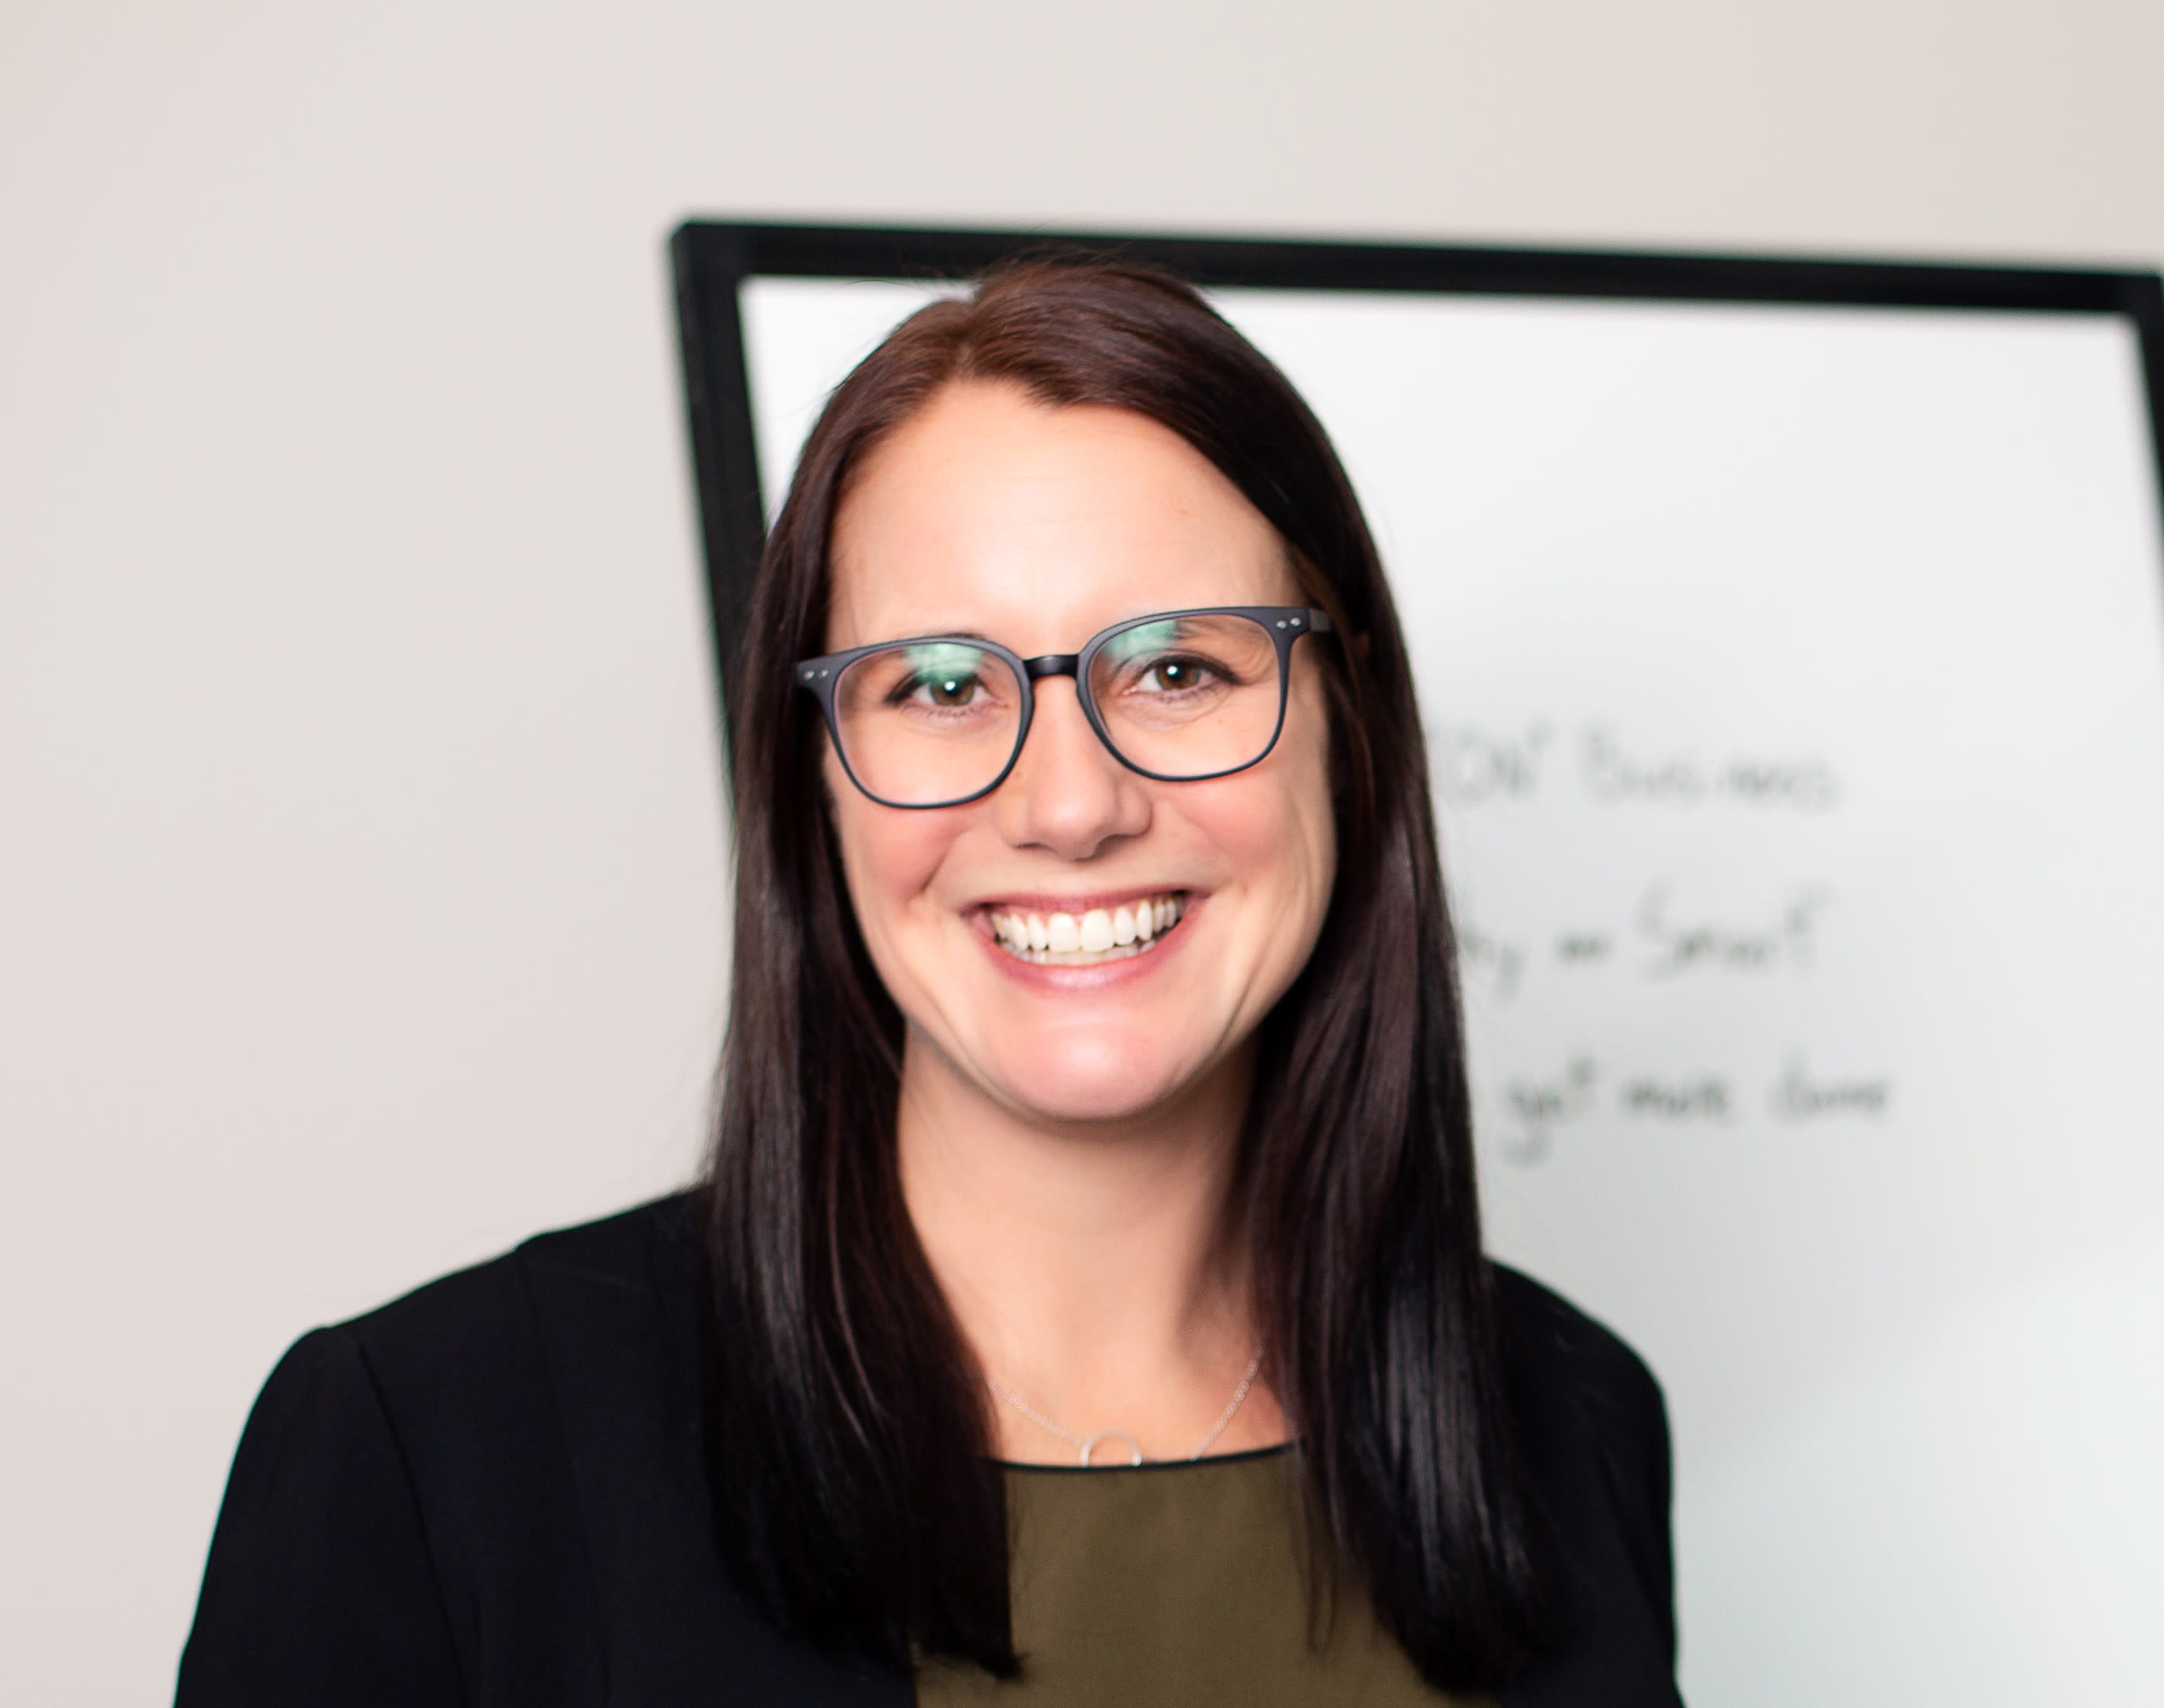 Barb Reimbold, EOS Implementer, Owner of Pivotal Blueprint